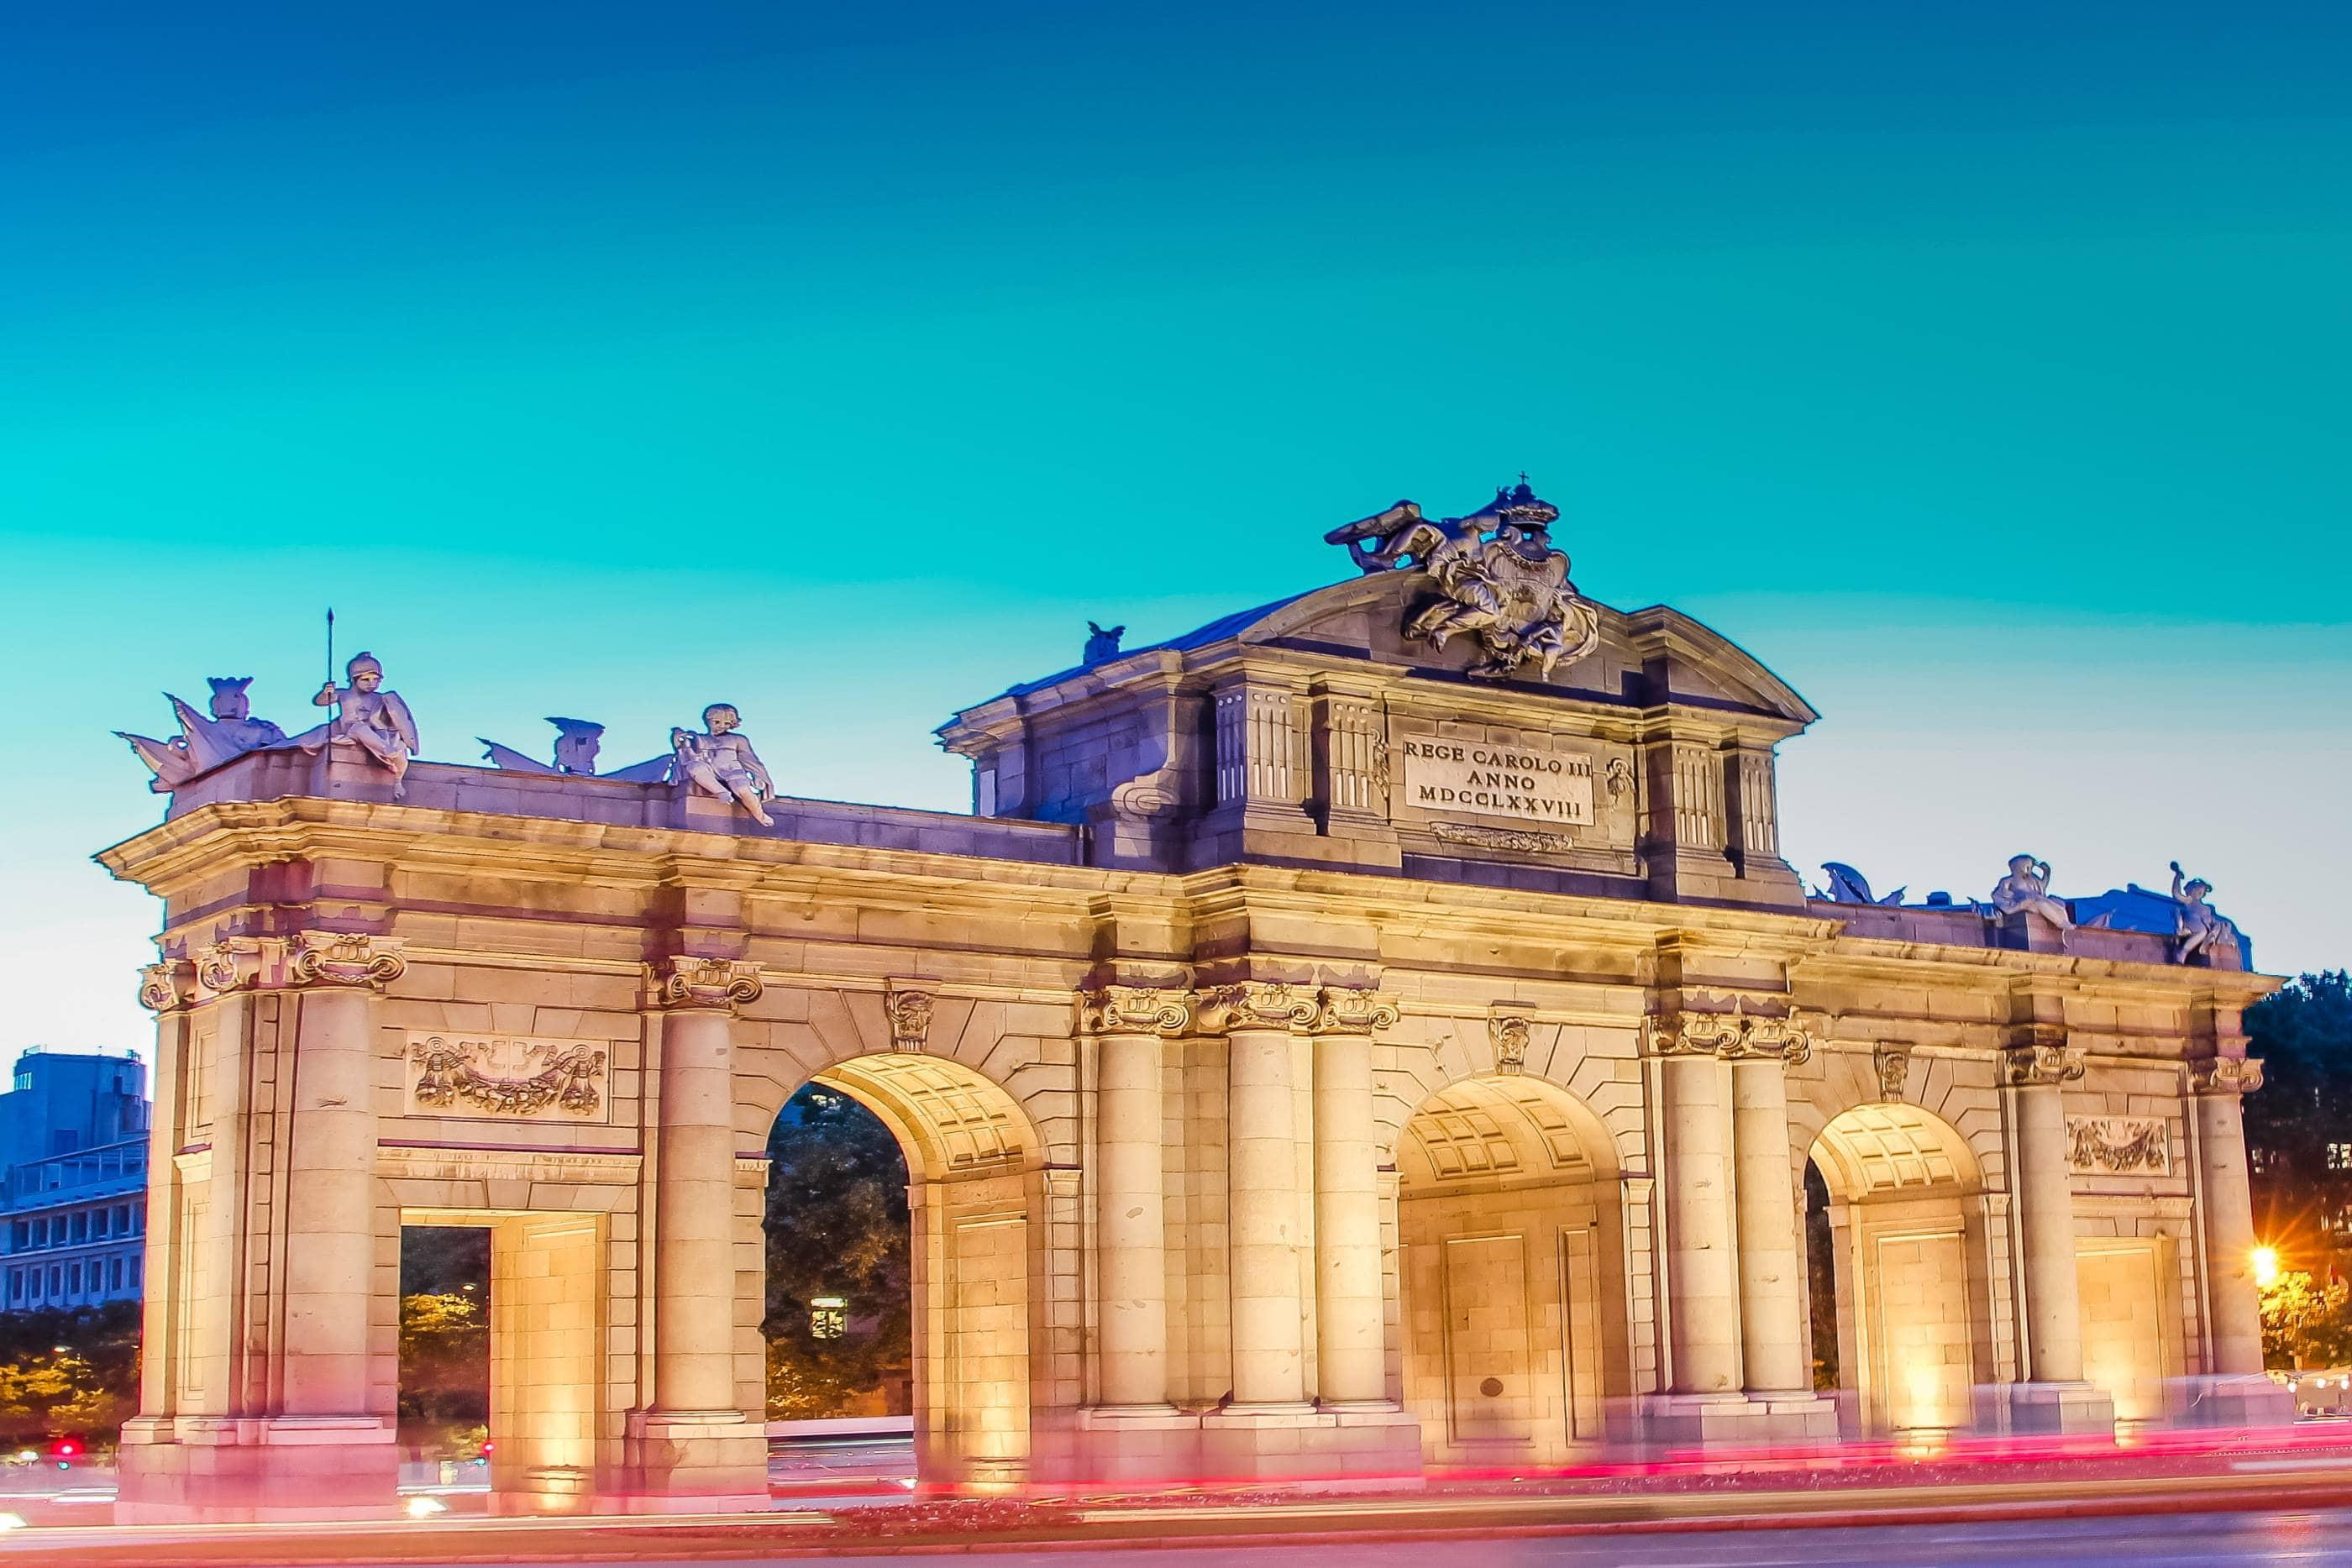 Madrid with Puerta de Alcalá by night - Photo by Tania Fernandez on Unsplash